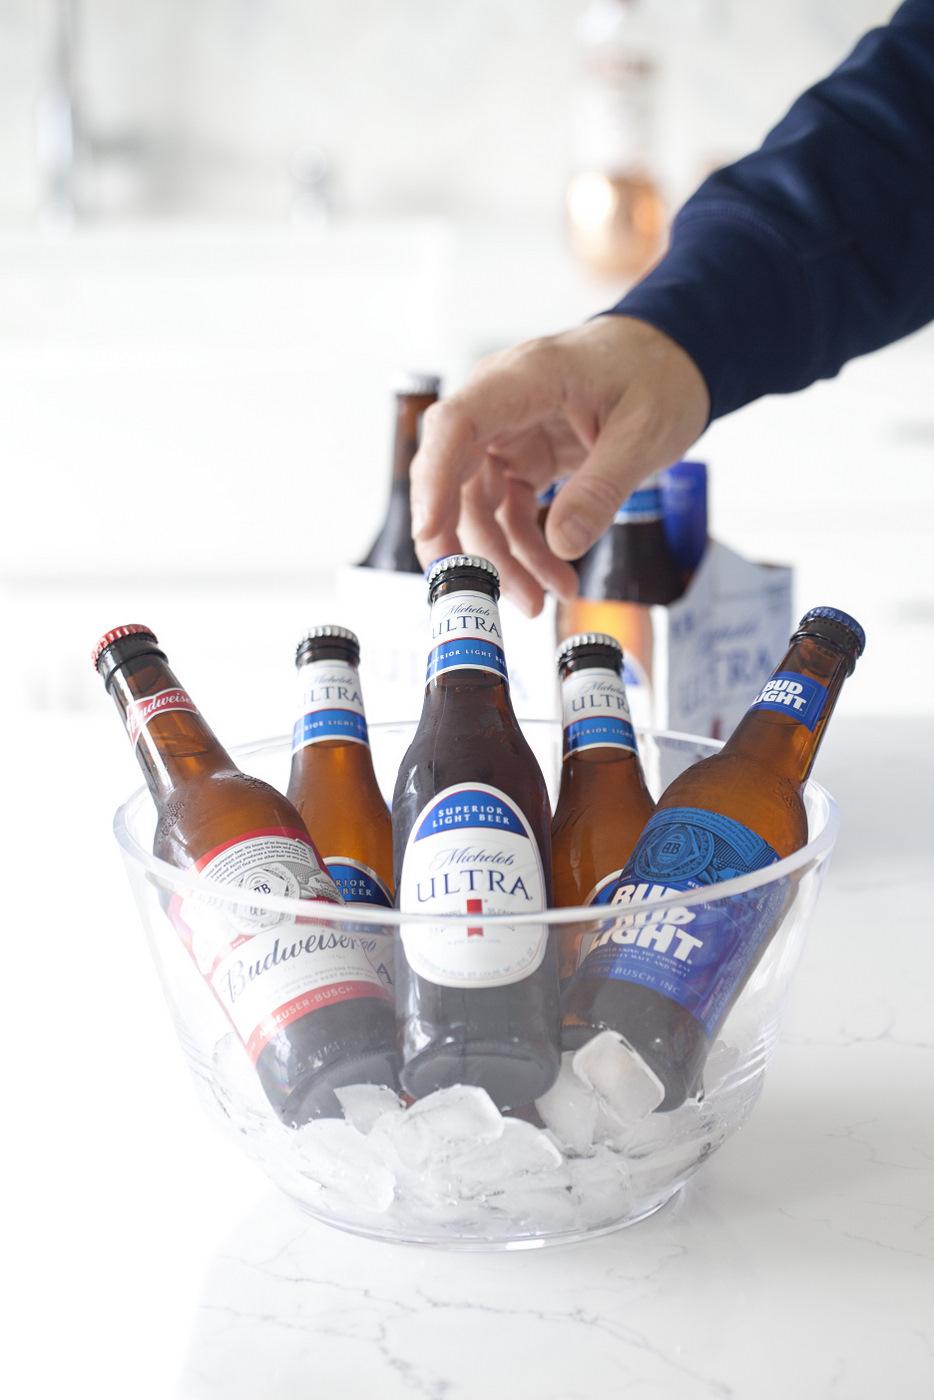 Super-bowl-beverages-drinks-wine-beer-smirnoff-yellow-tail